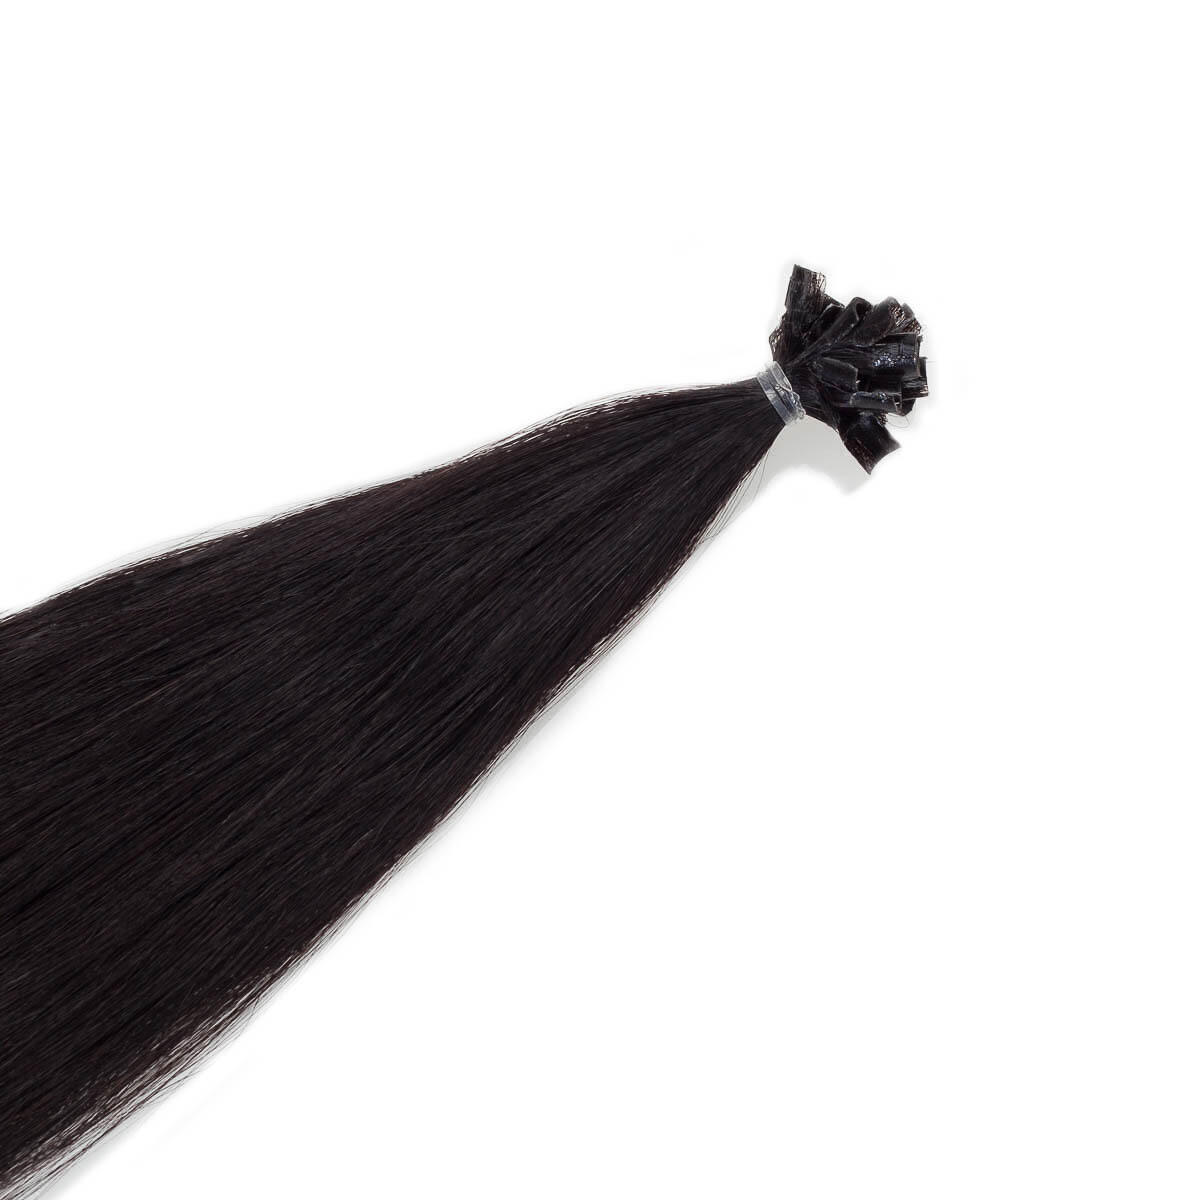 Bondings Premium Glatt 1.2 Black Brown 60 cm